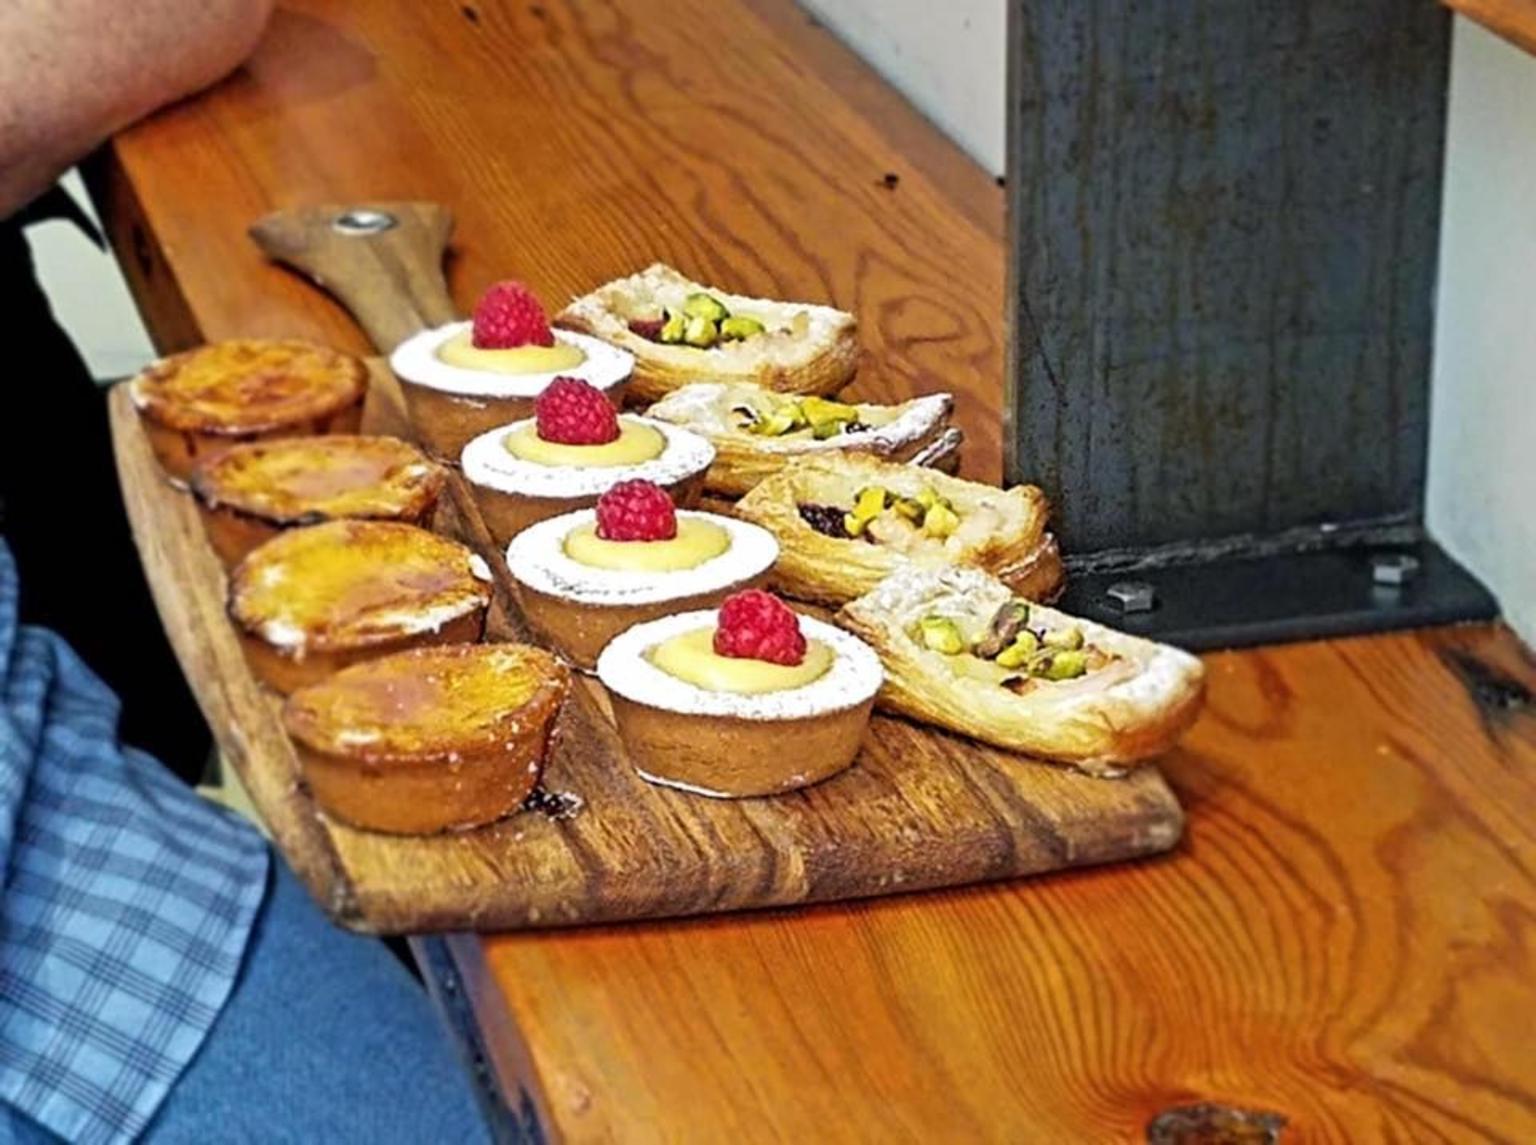 MÁS FOTOS, Downtown Victoria Food & City Tour